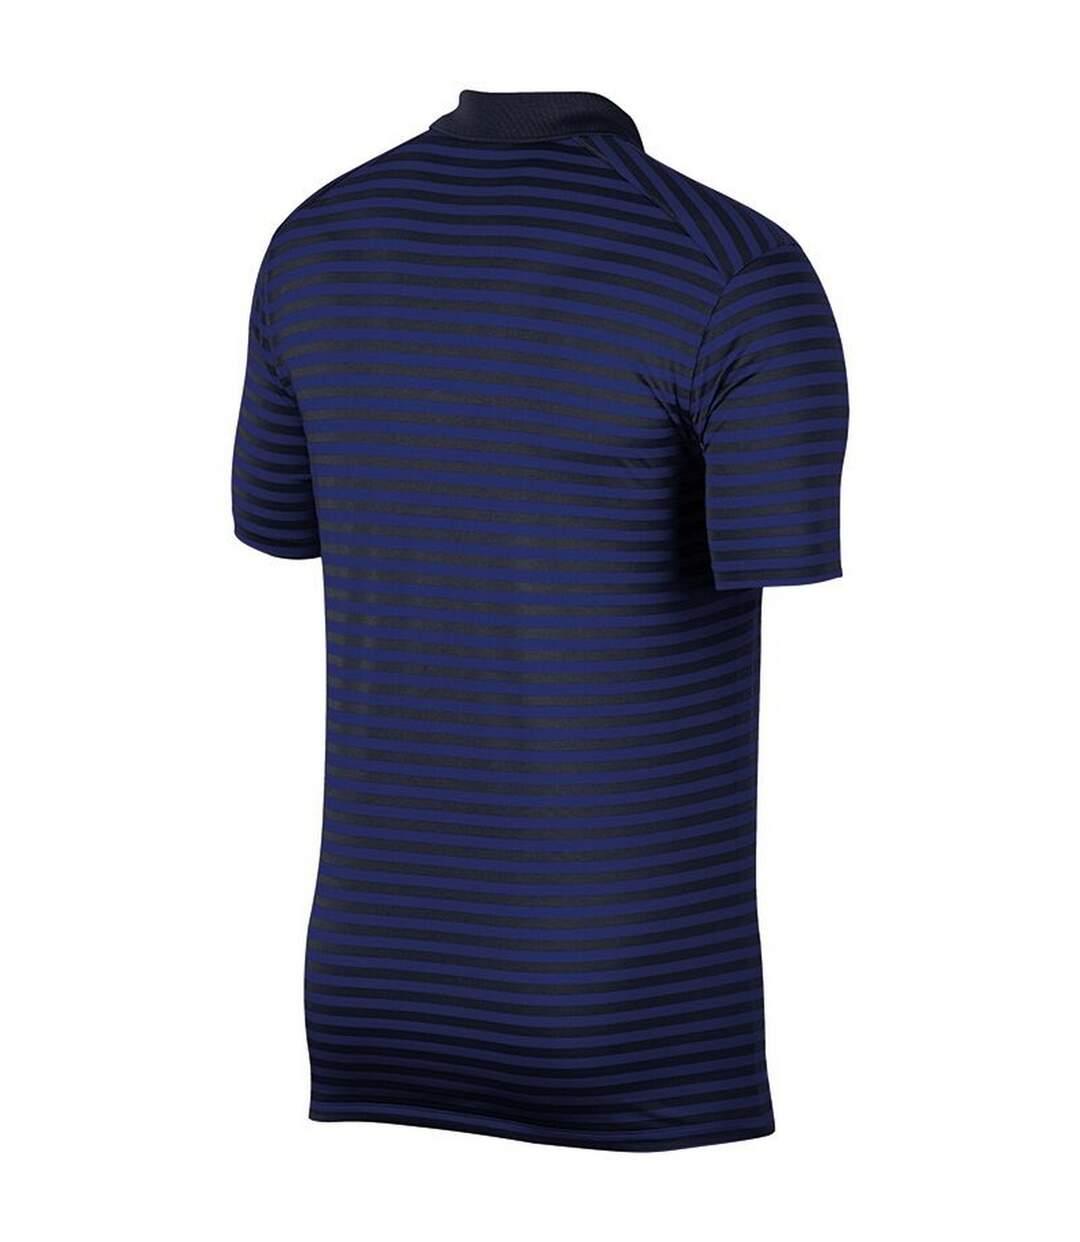 Nike Mens Dry Victory Stripe Polo (Obsidian/Deep Royal Blue/FLT Silver) - UTRW6579